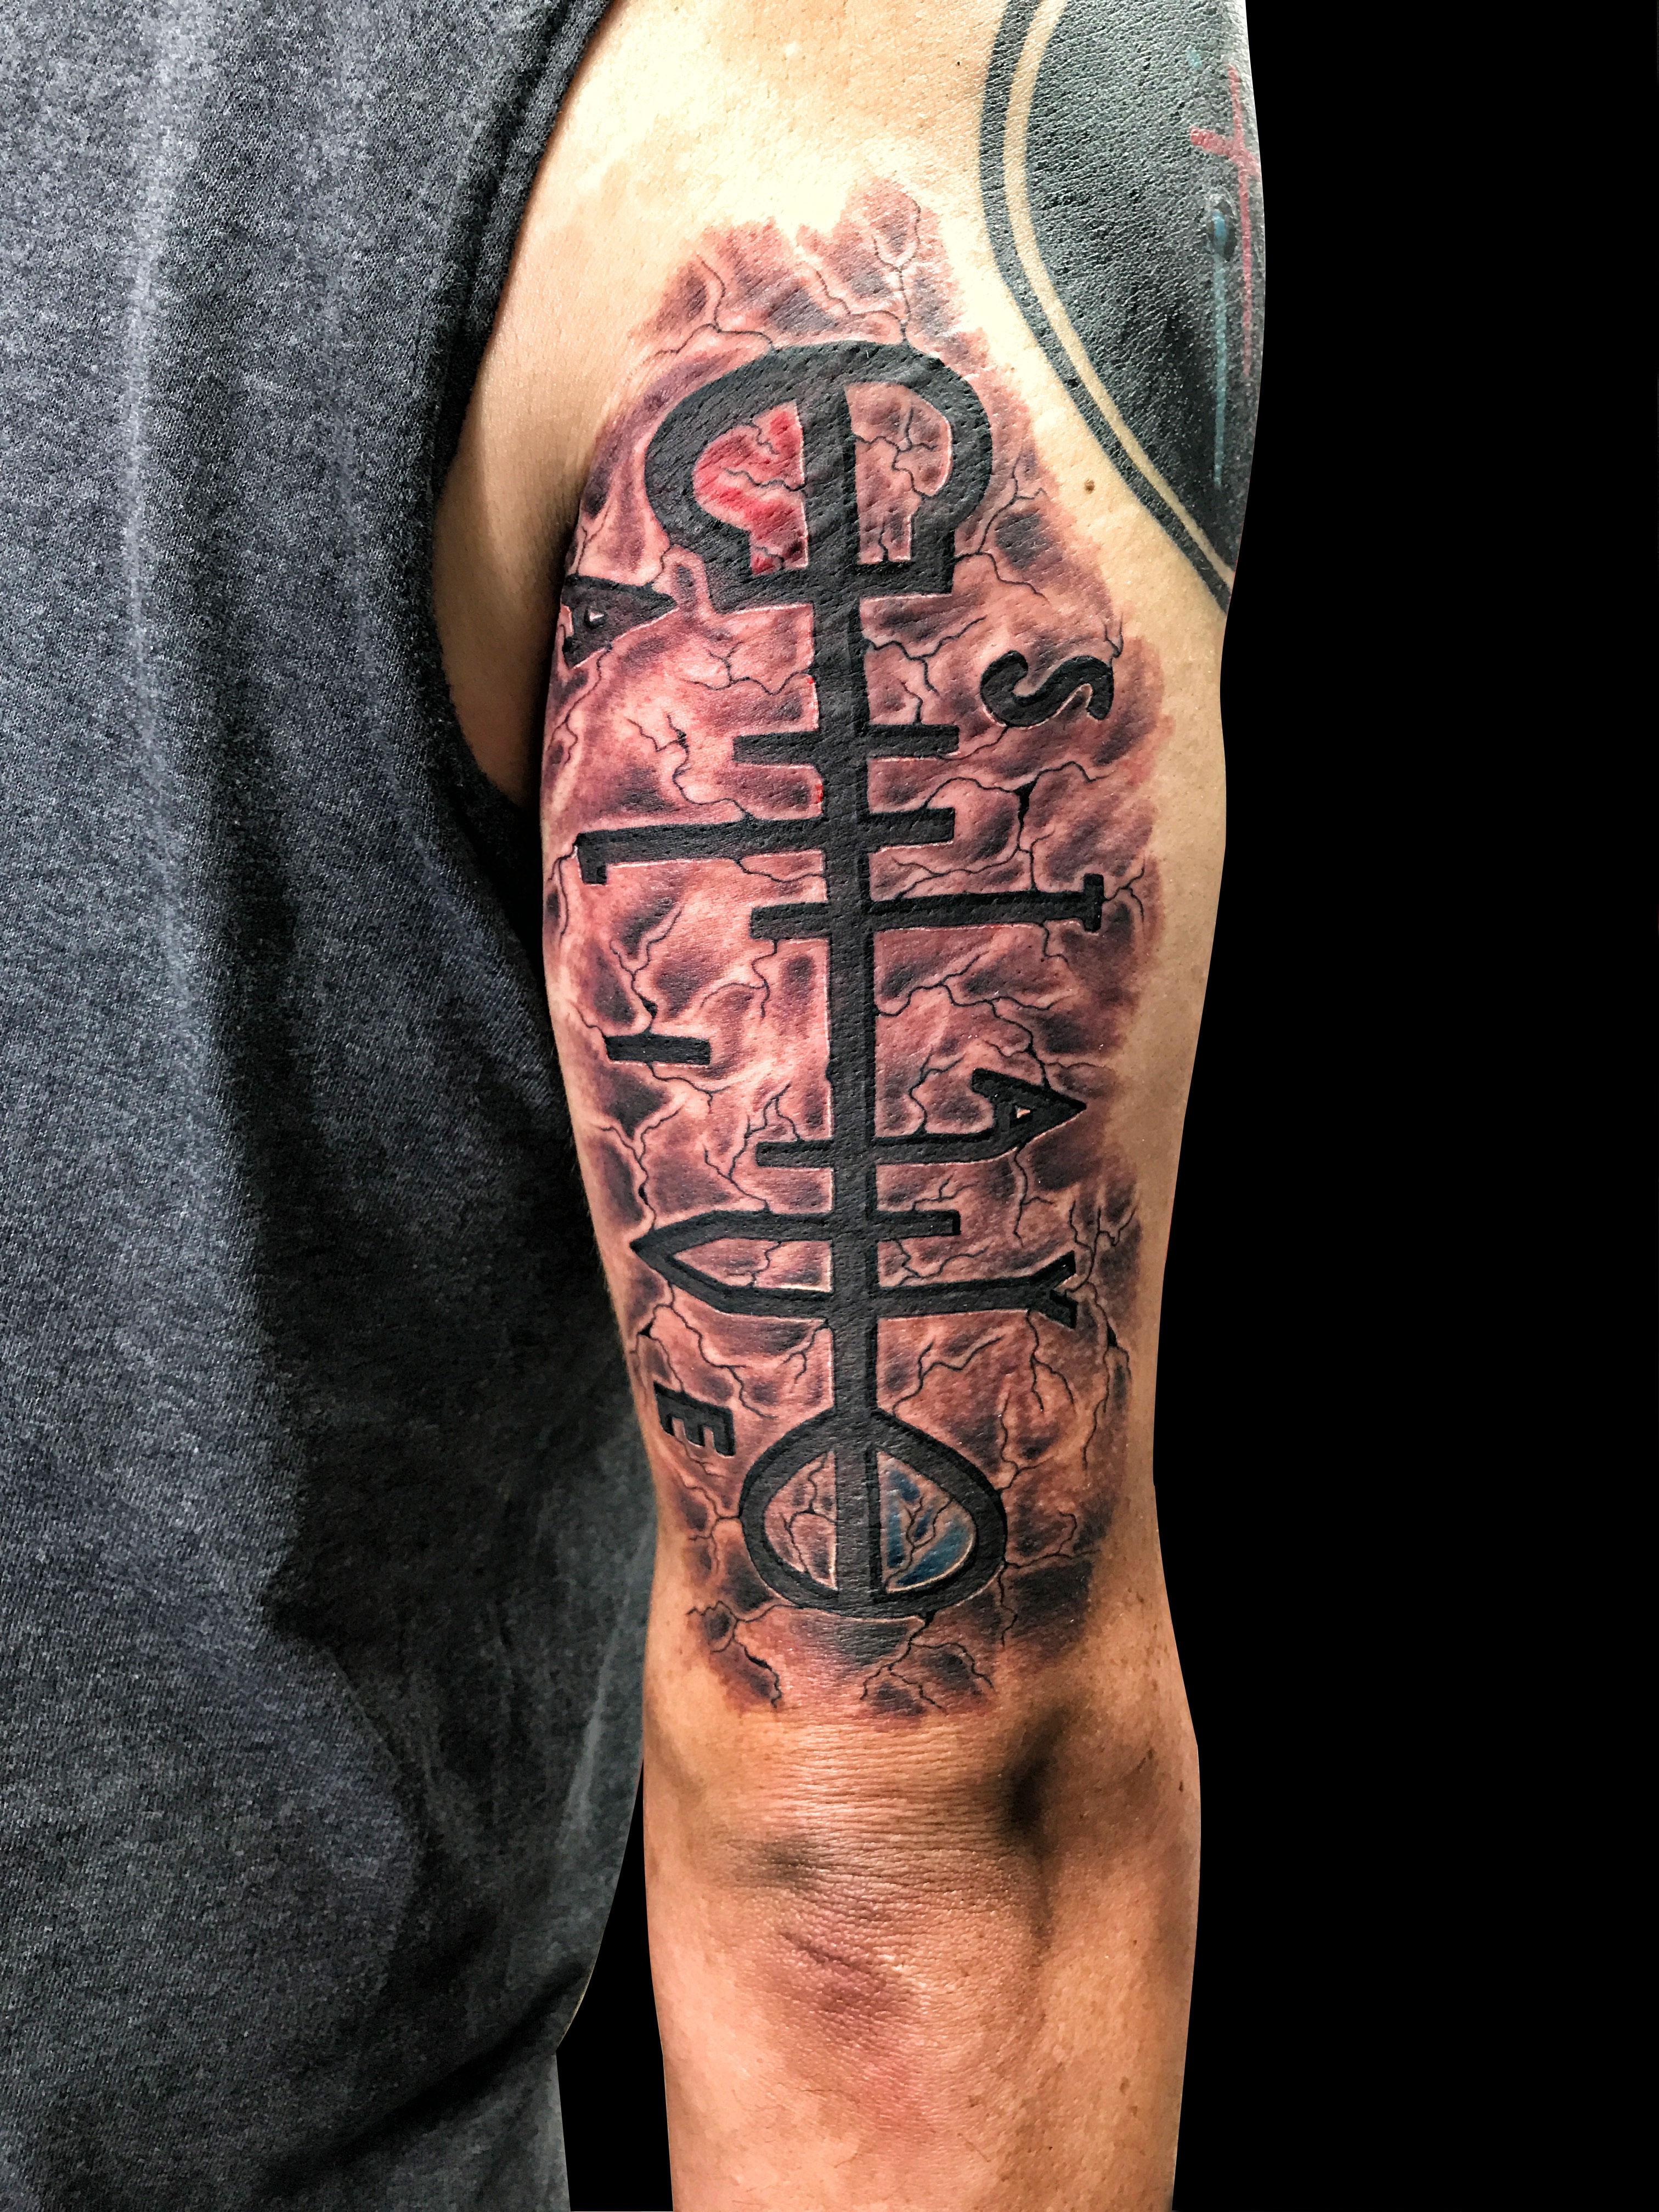 Q Tattoo in Huntington Beach - Sara Delara - stay alive